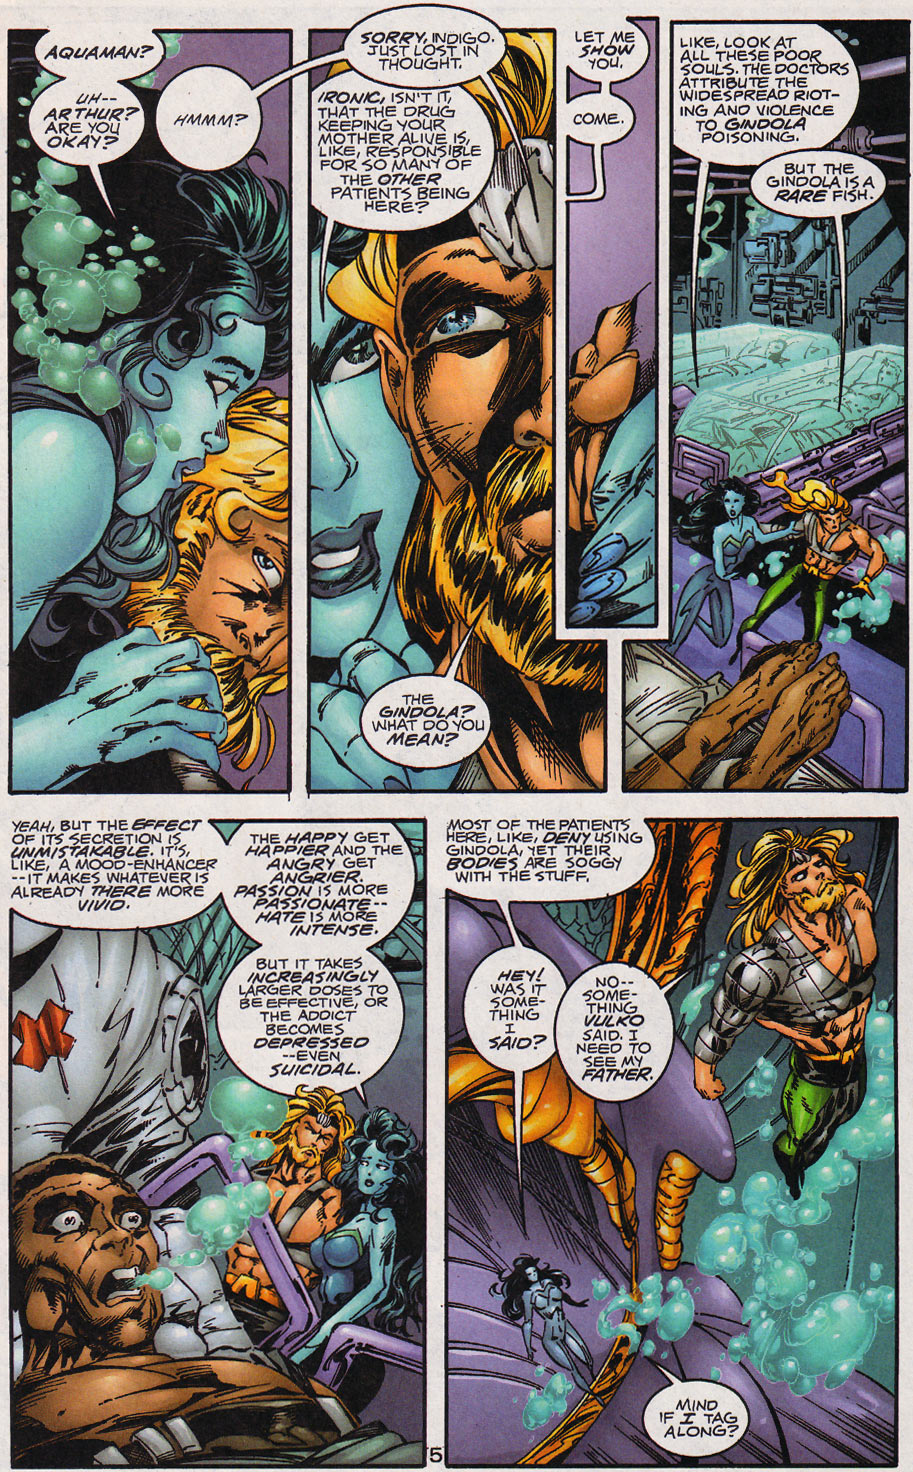 Read online Aquaman (1994) comic -  Issue #59 - 6